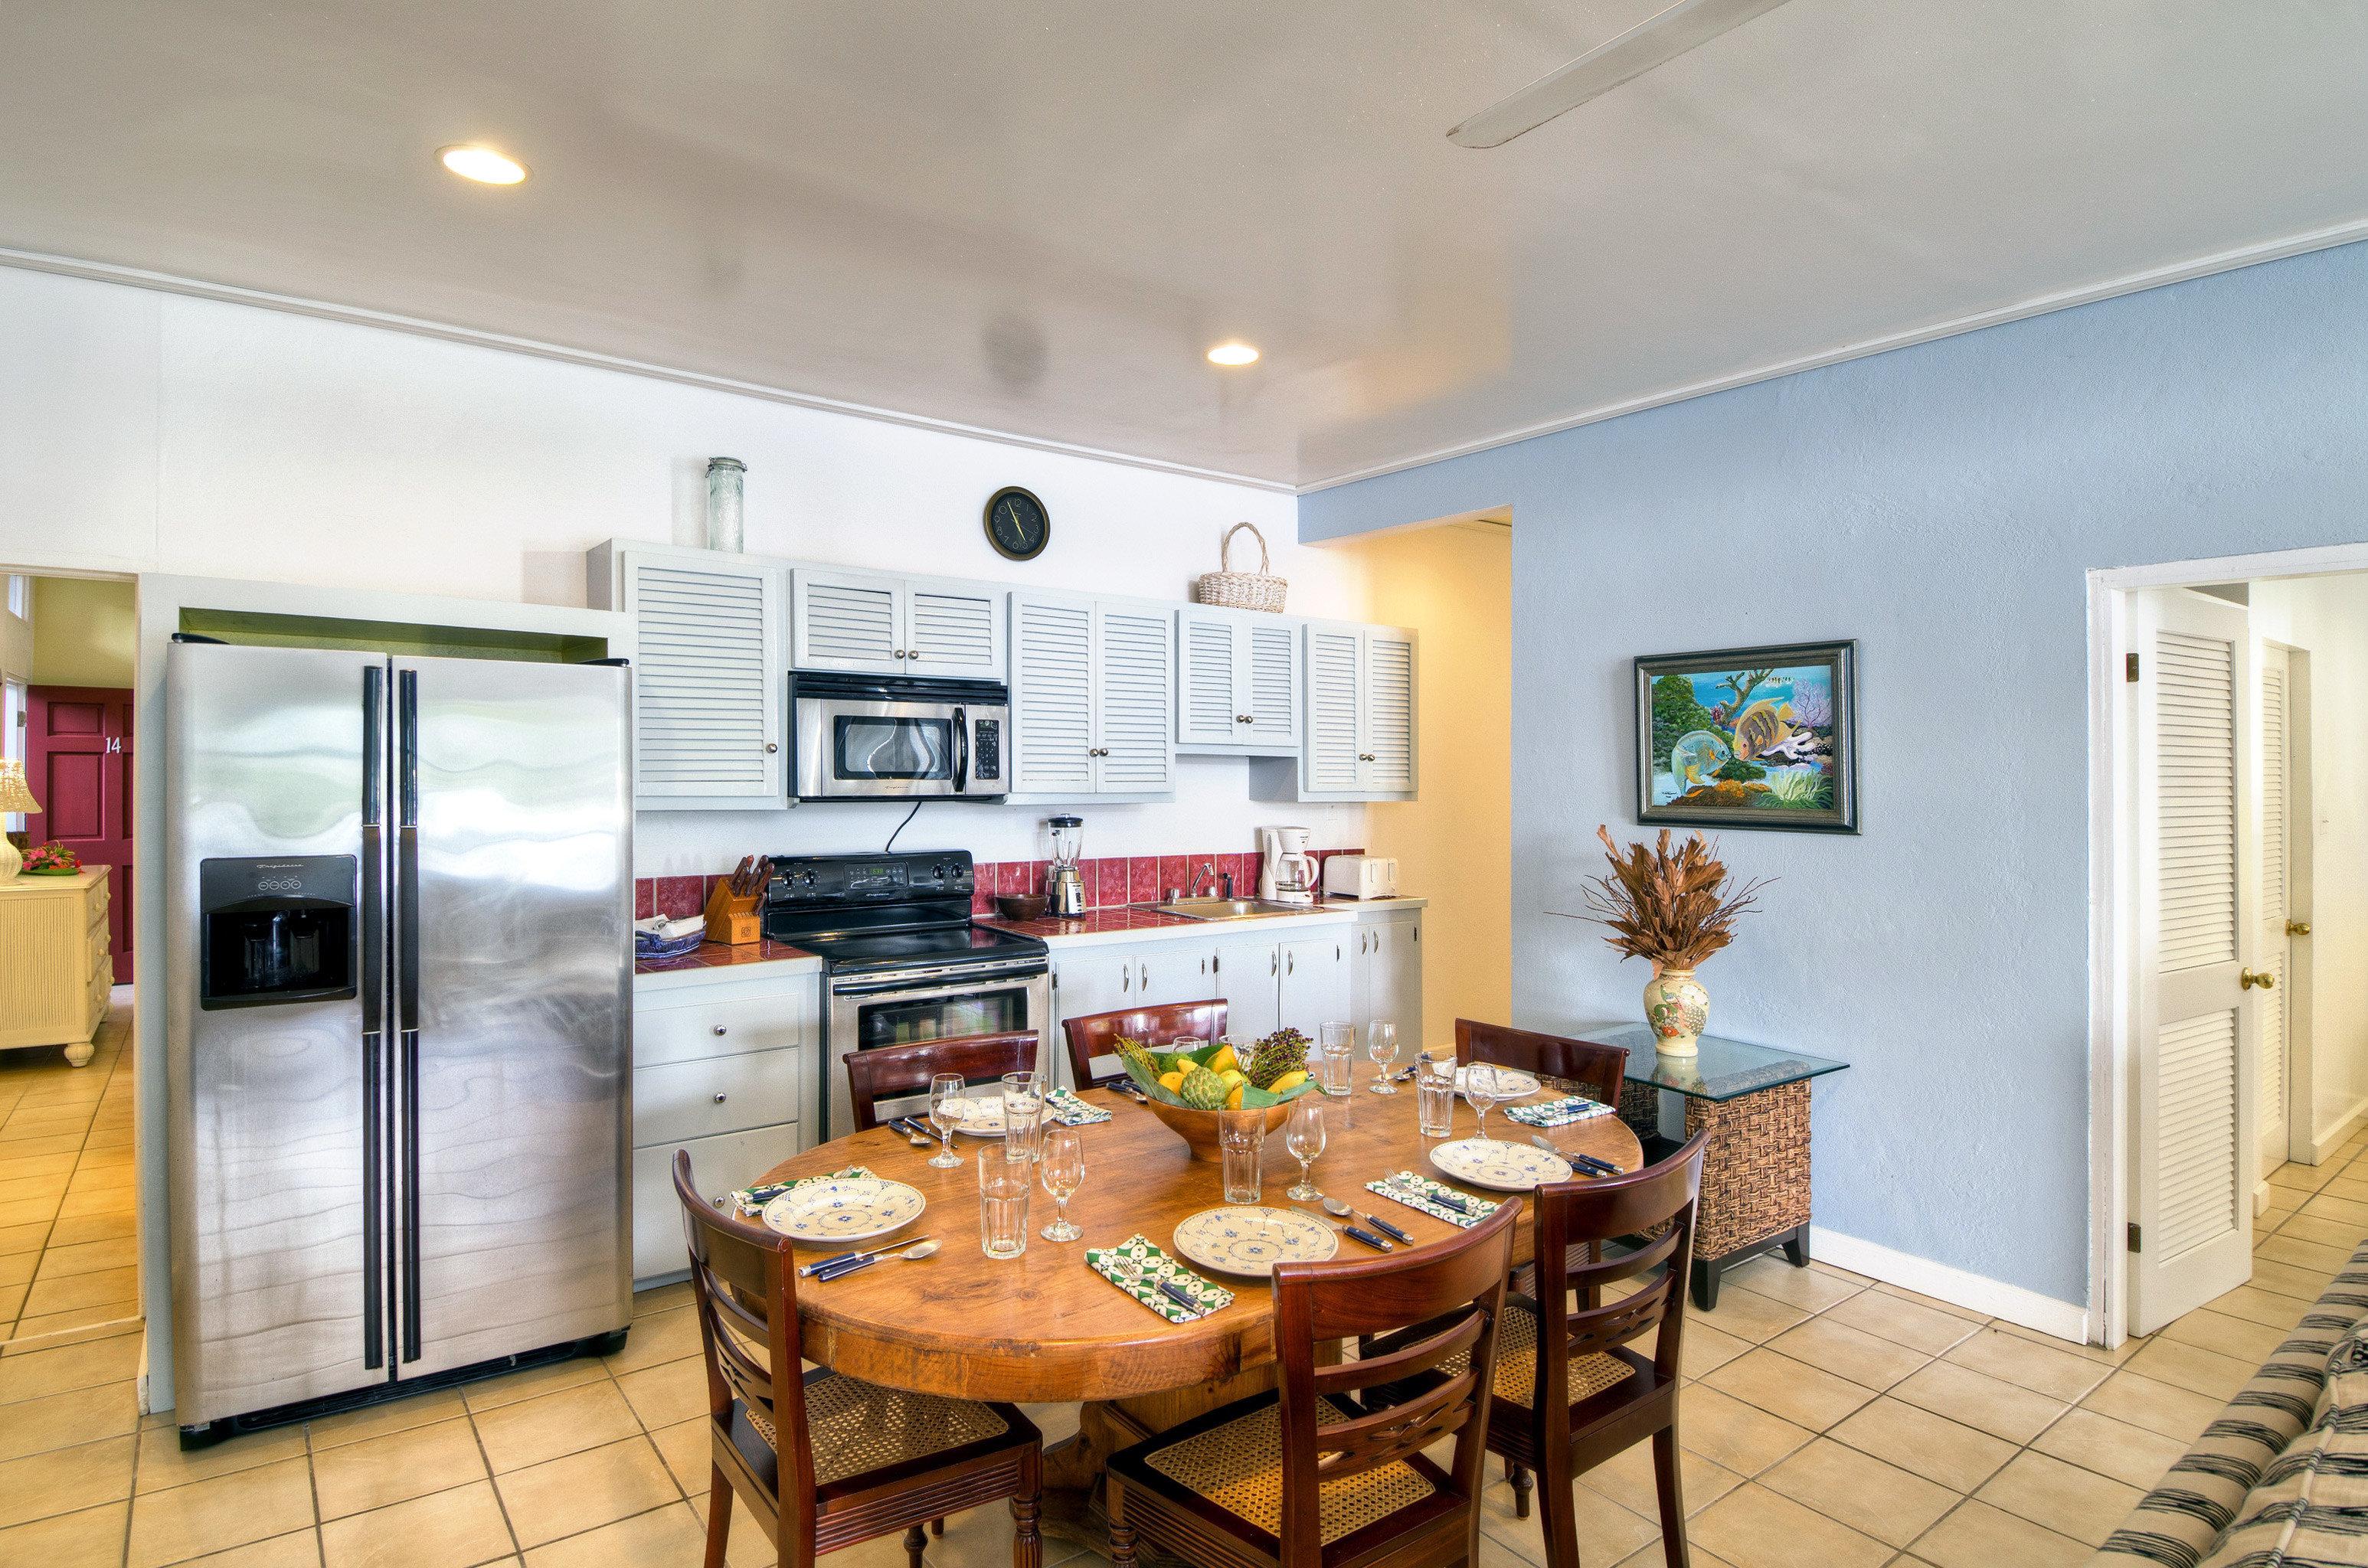 Dining Drink Eat Kitchen Modern Suite property home living room cottage farmhouse condominium Villa loft